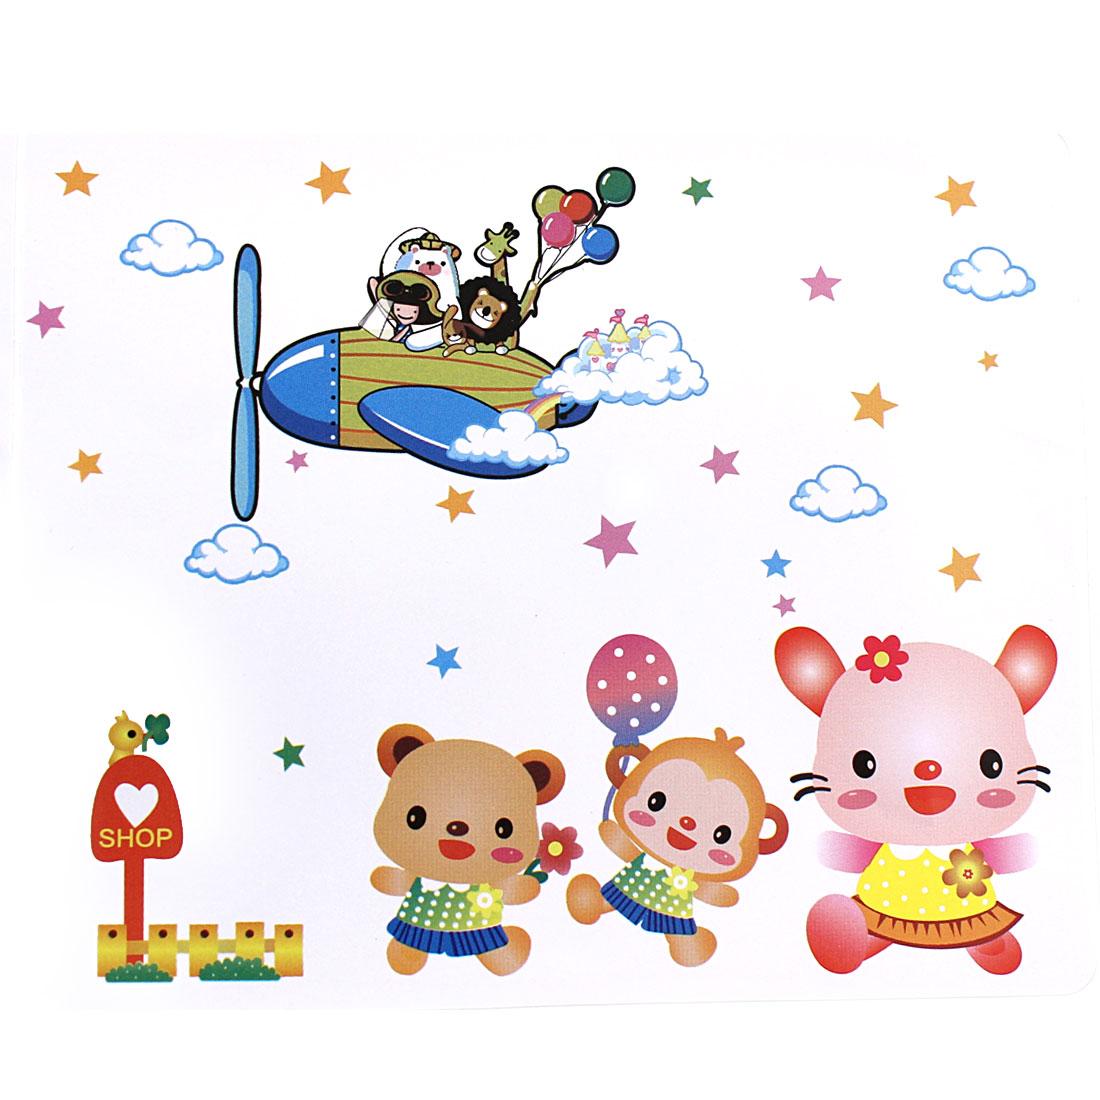 Kid Room Cartoon Bear Pattern Removable Wall Sticker Wallpaper Decor